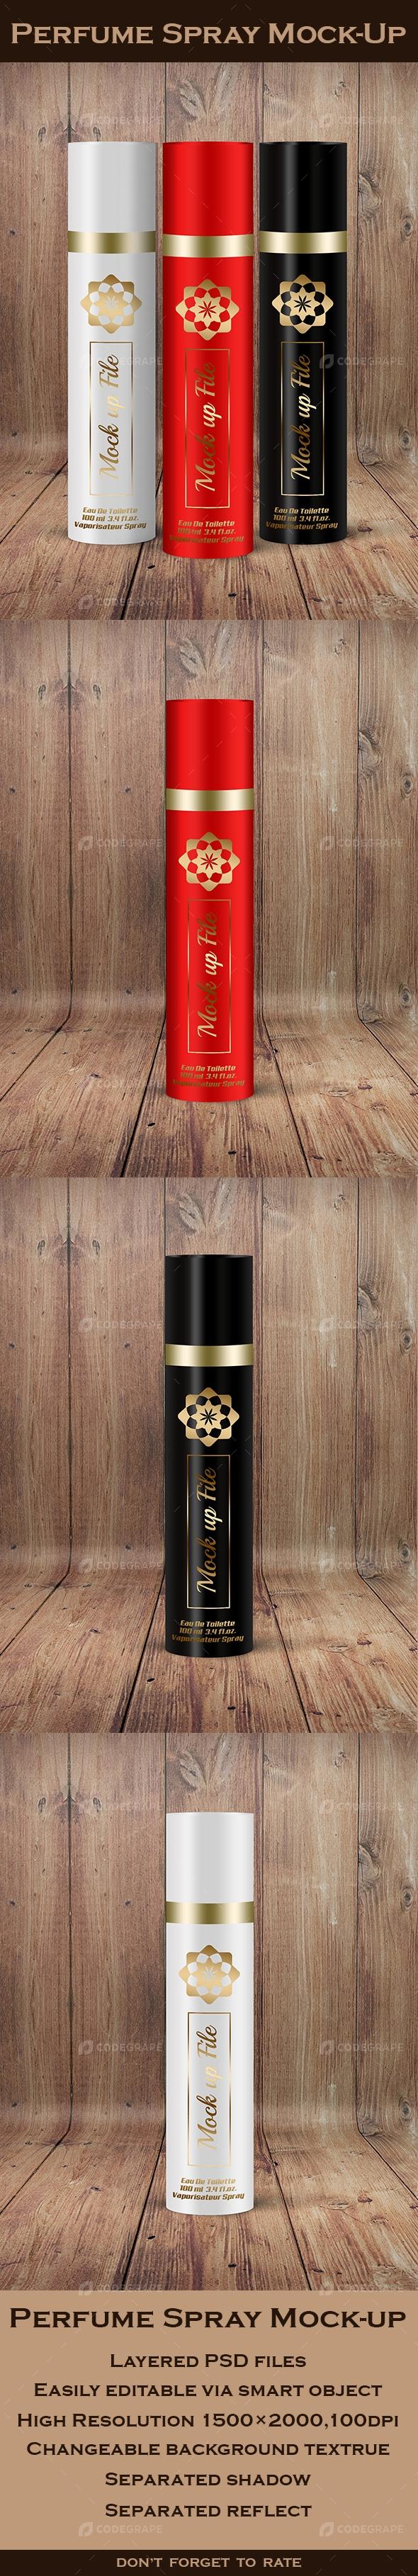 Perfume Spray Mock-Up